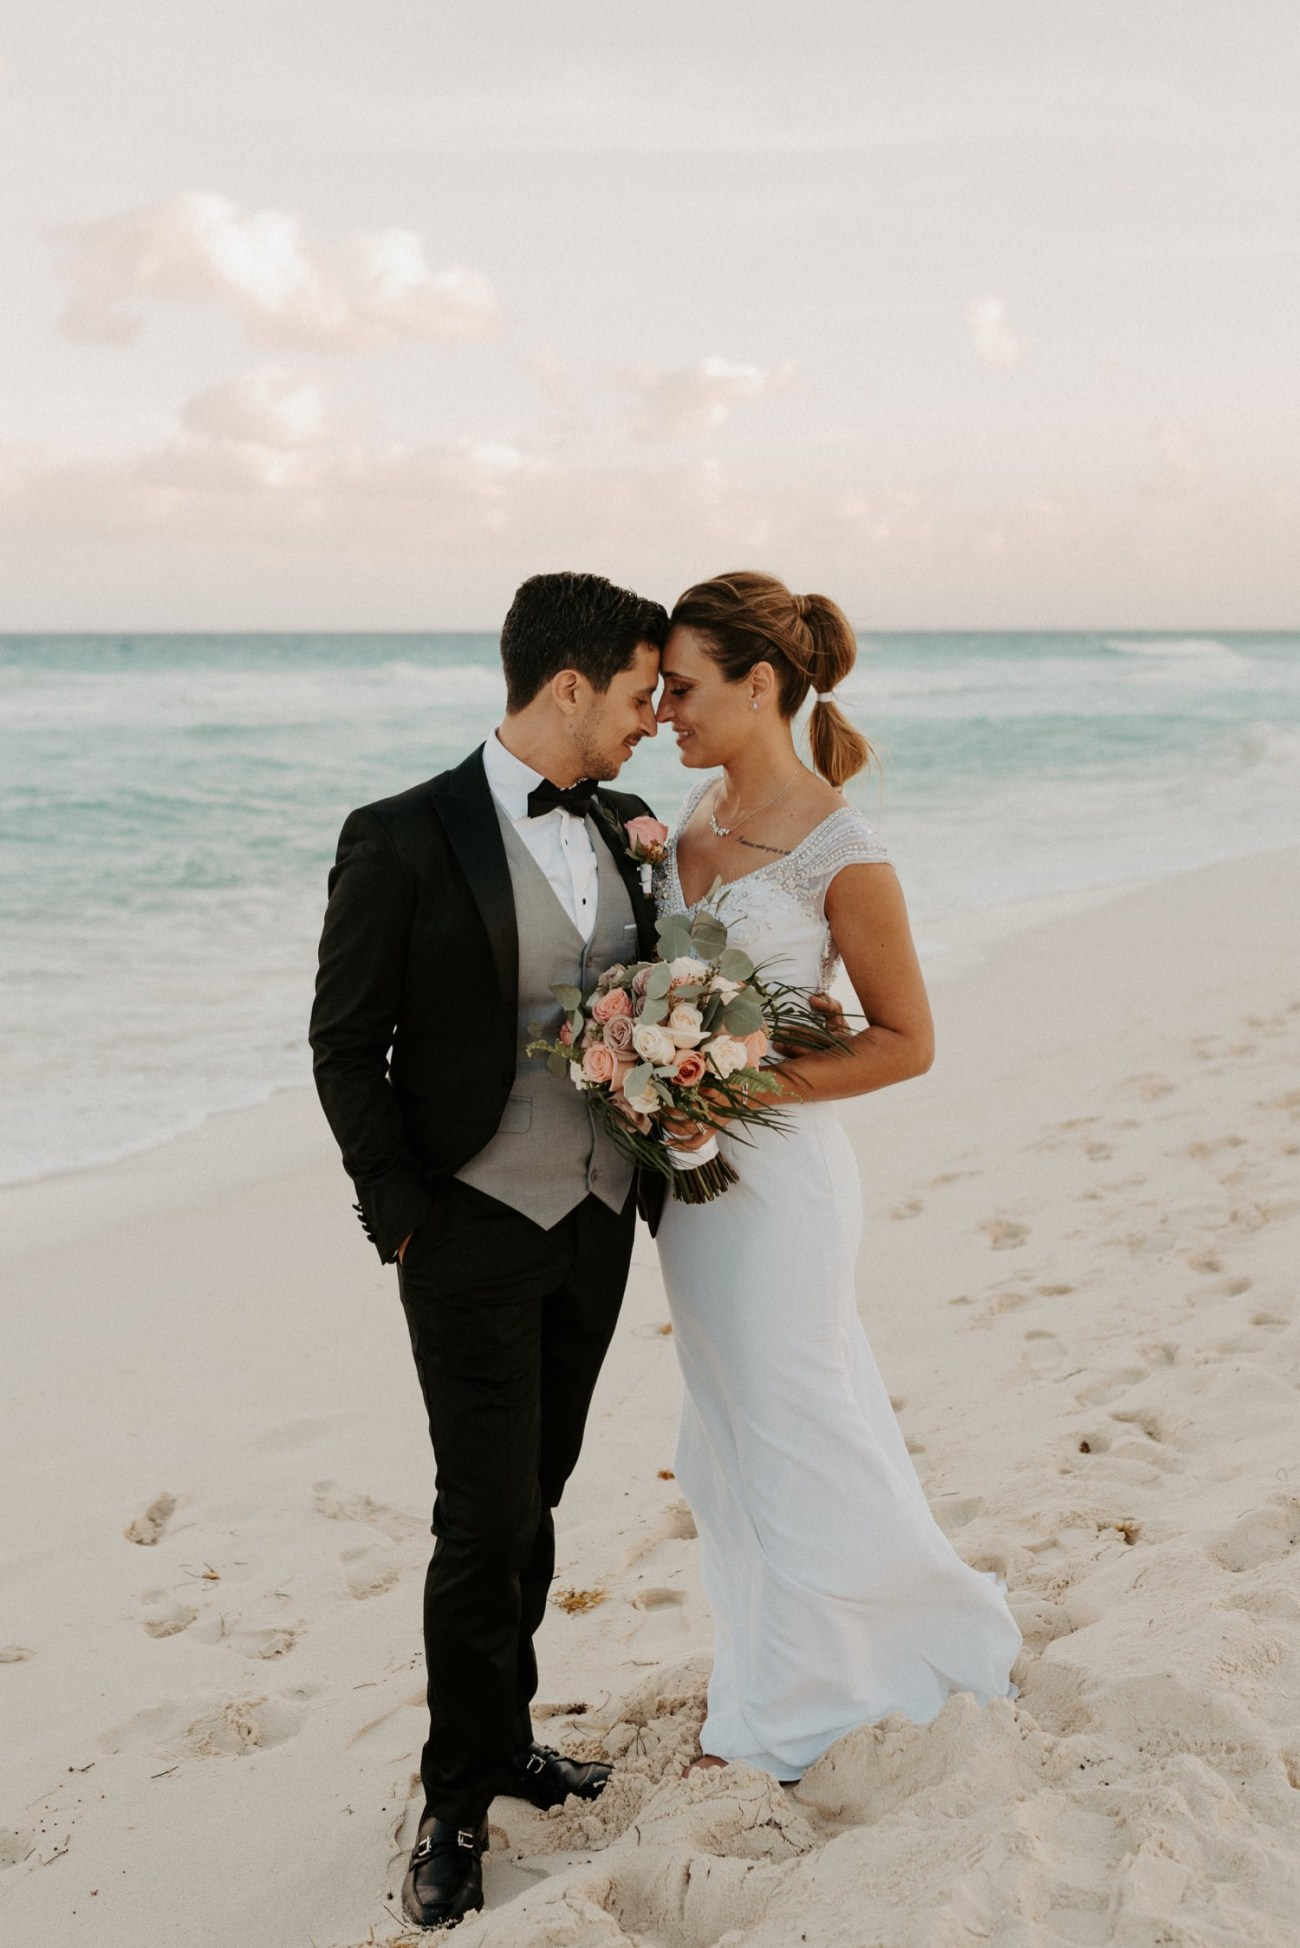 Cancun Destination Wedding Mexico Tulum Wedding Photographer Anais Possamai Photography 042